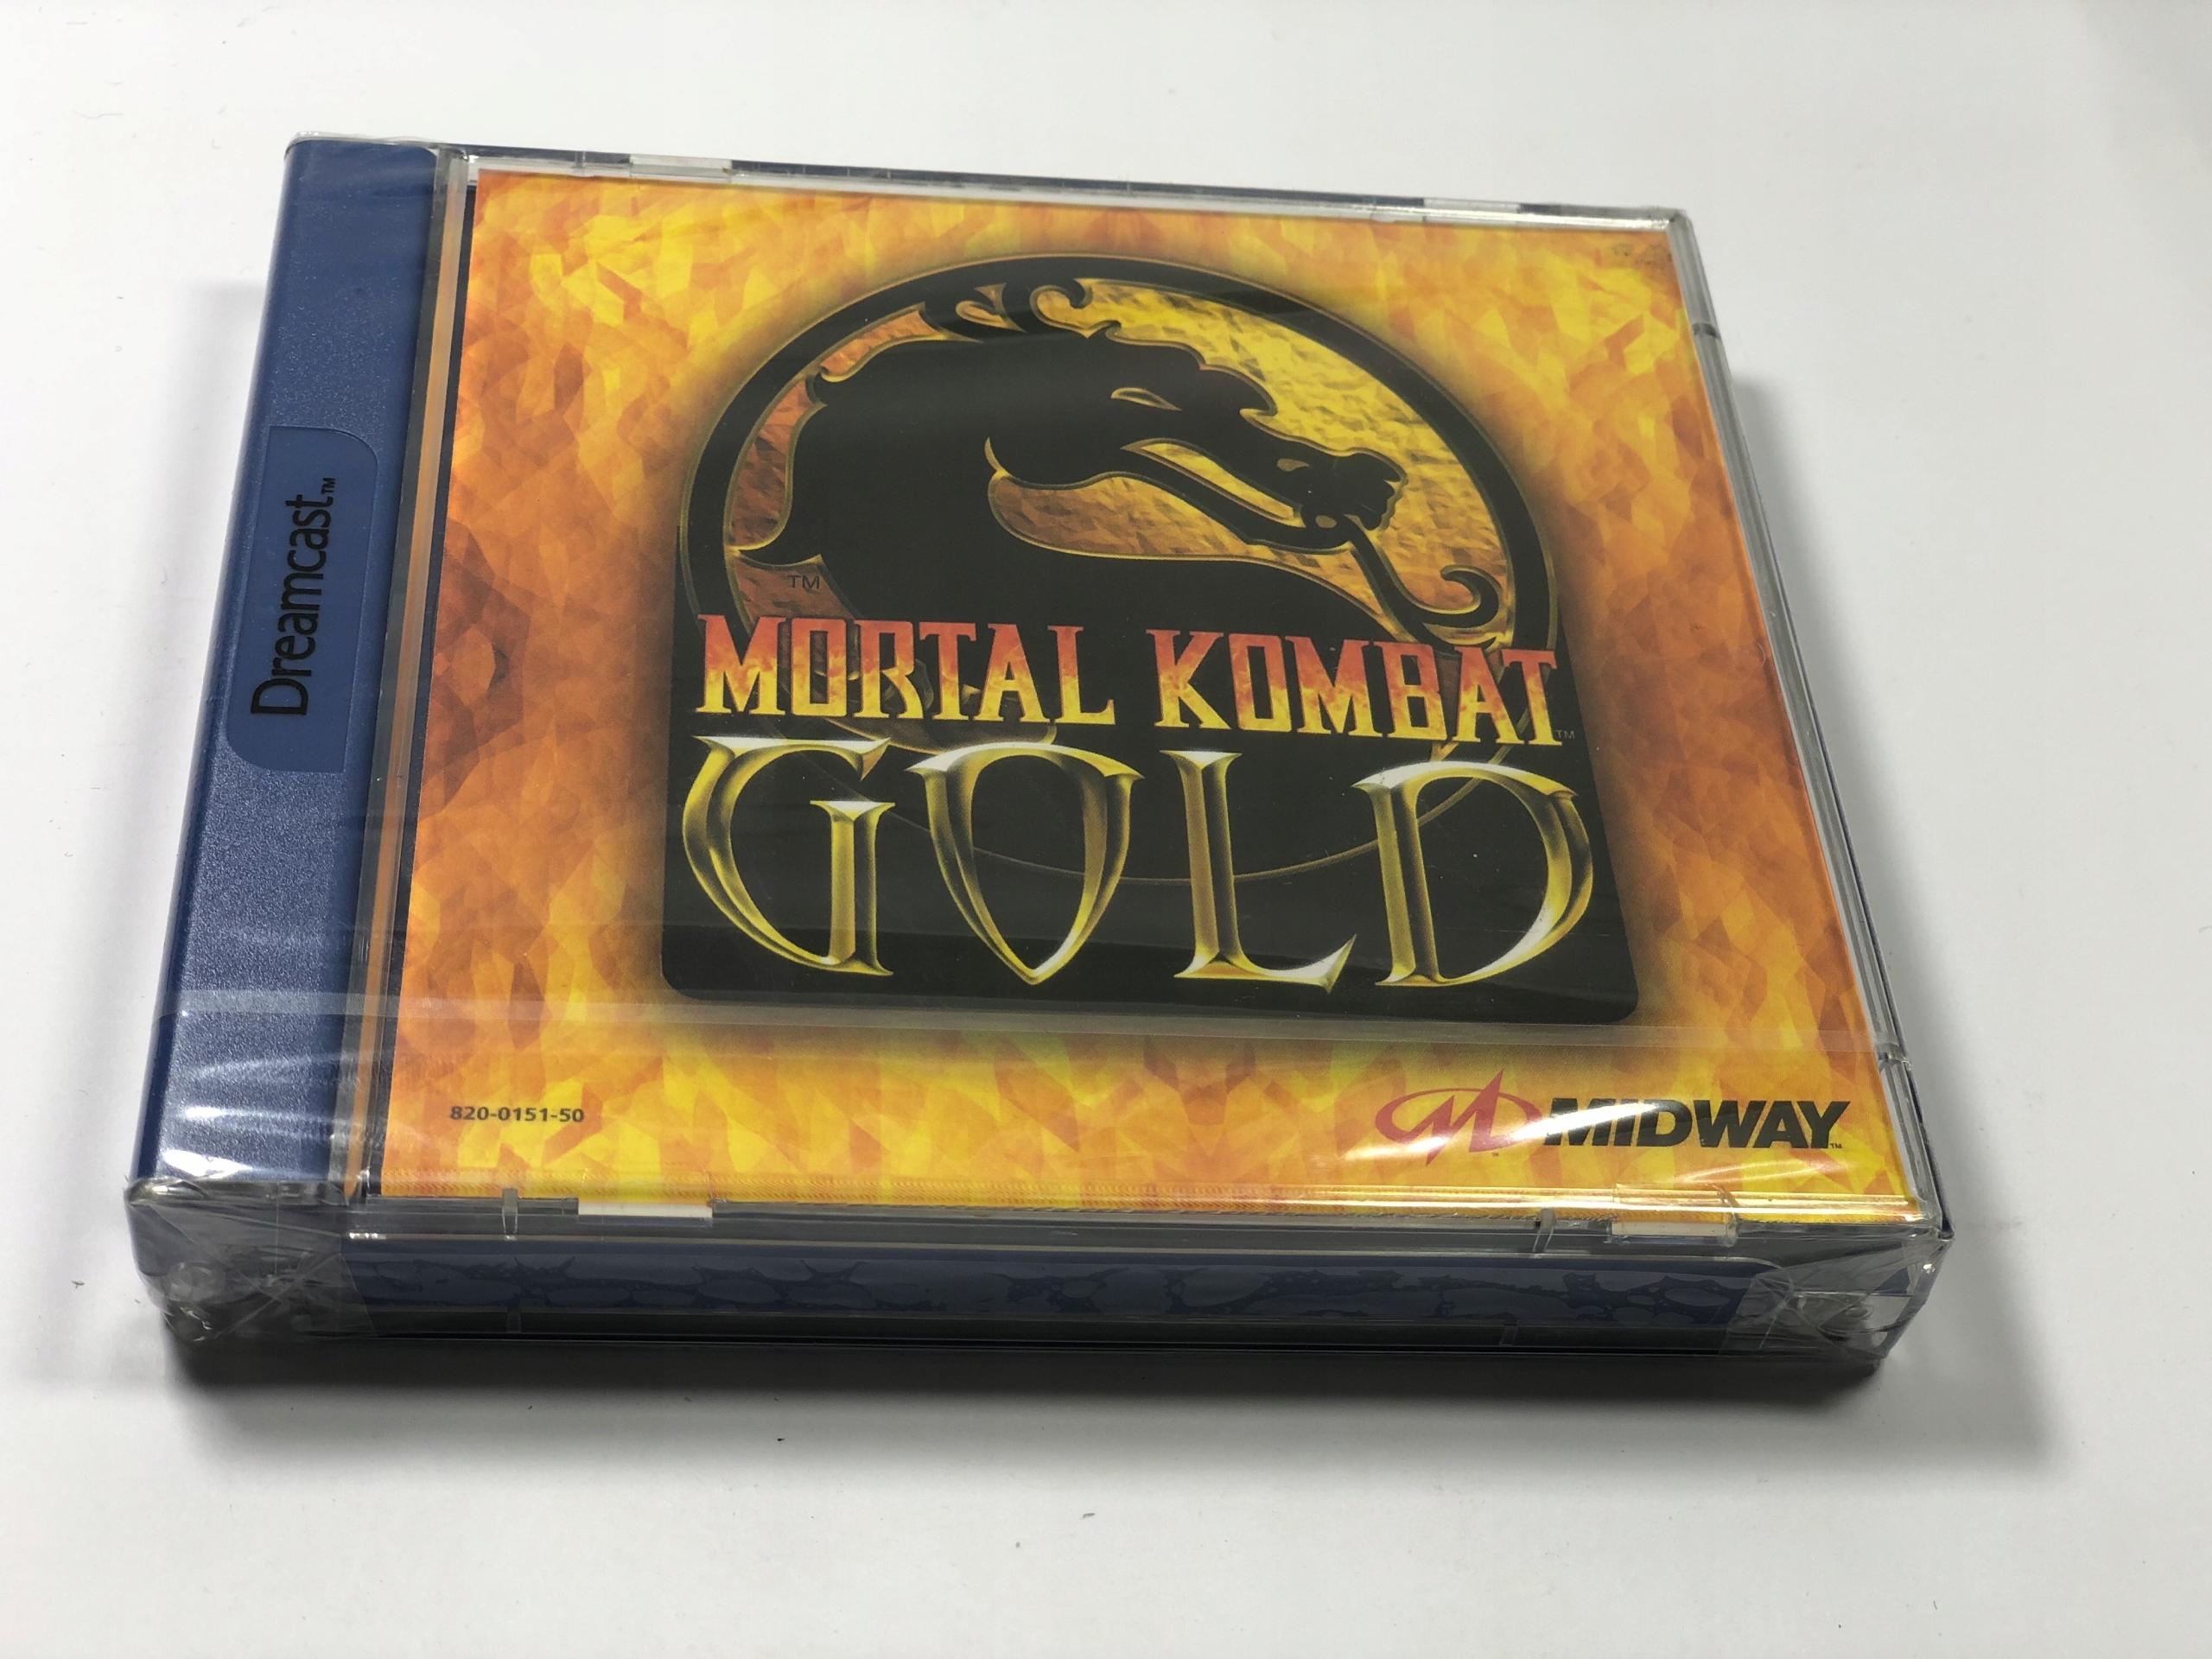 Mortal Kombat Gold NOVINKA Sega Dreamcast FILM